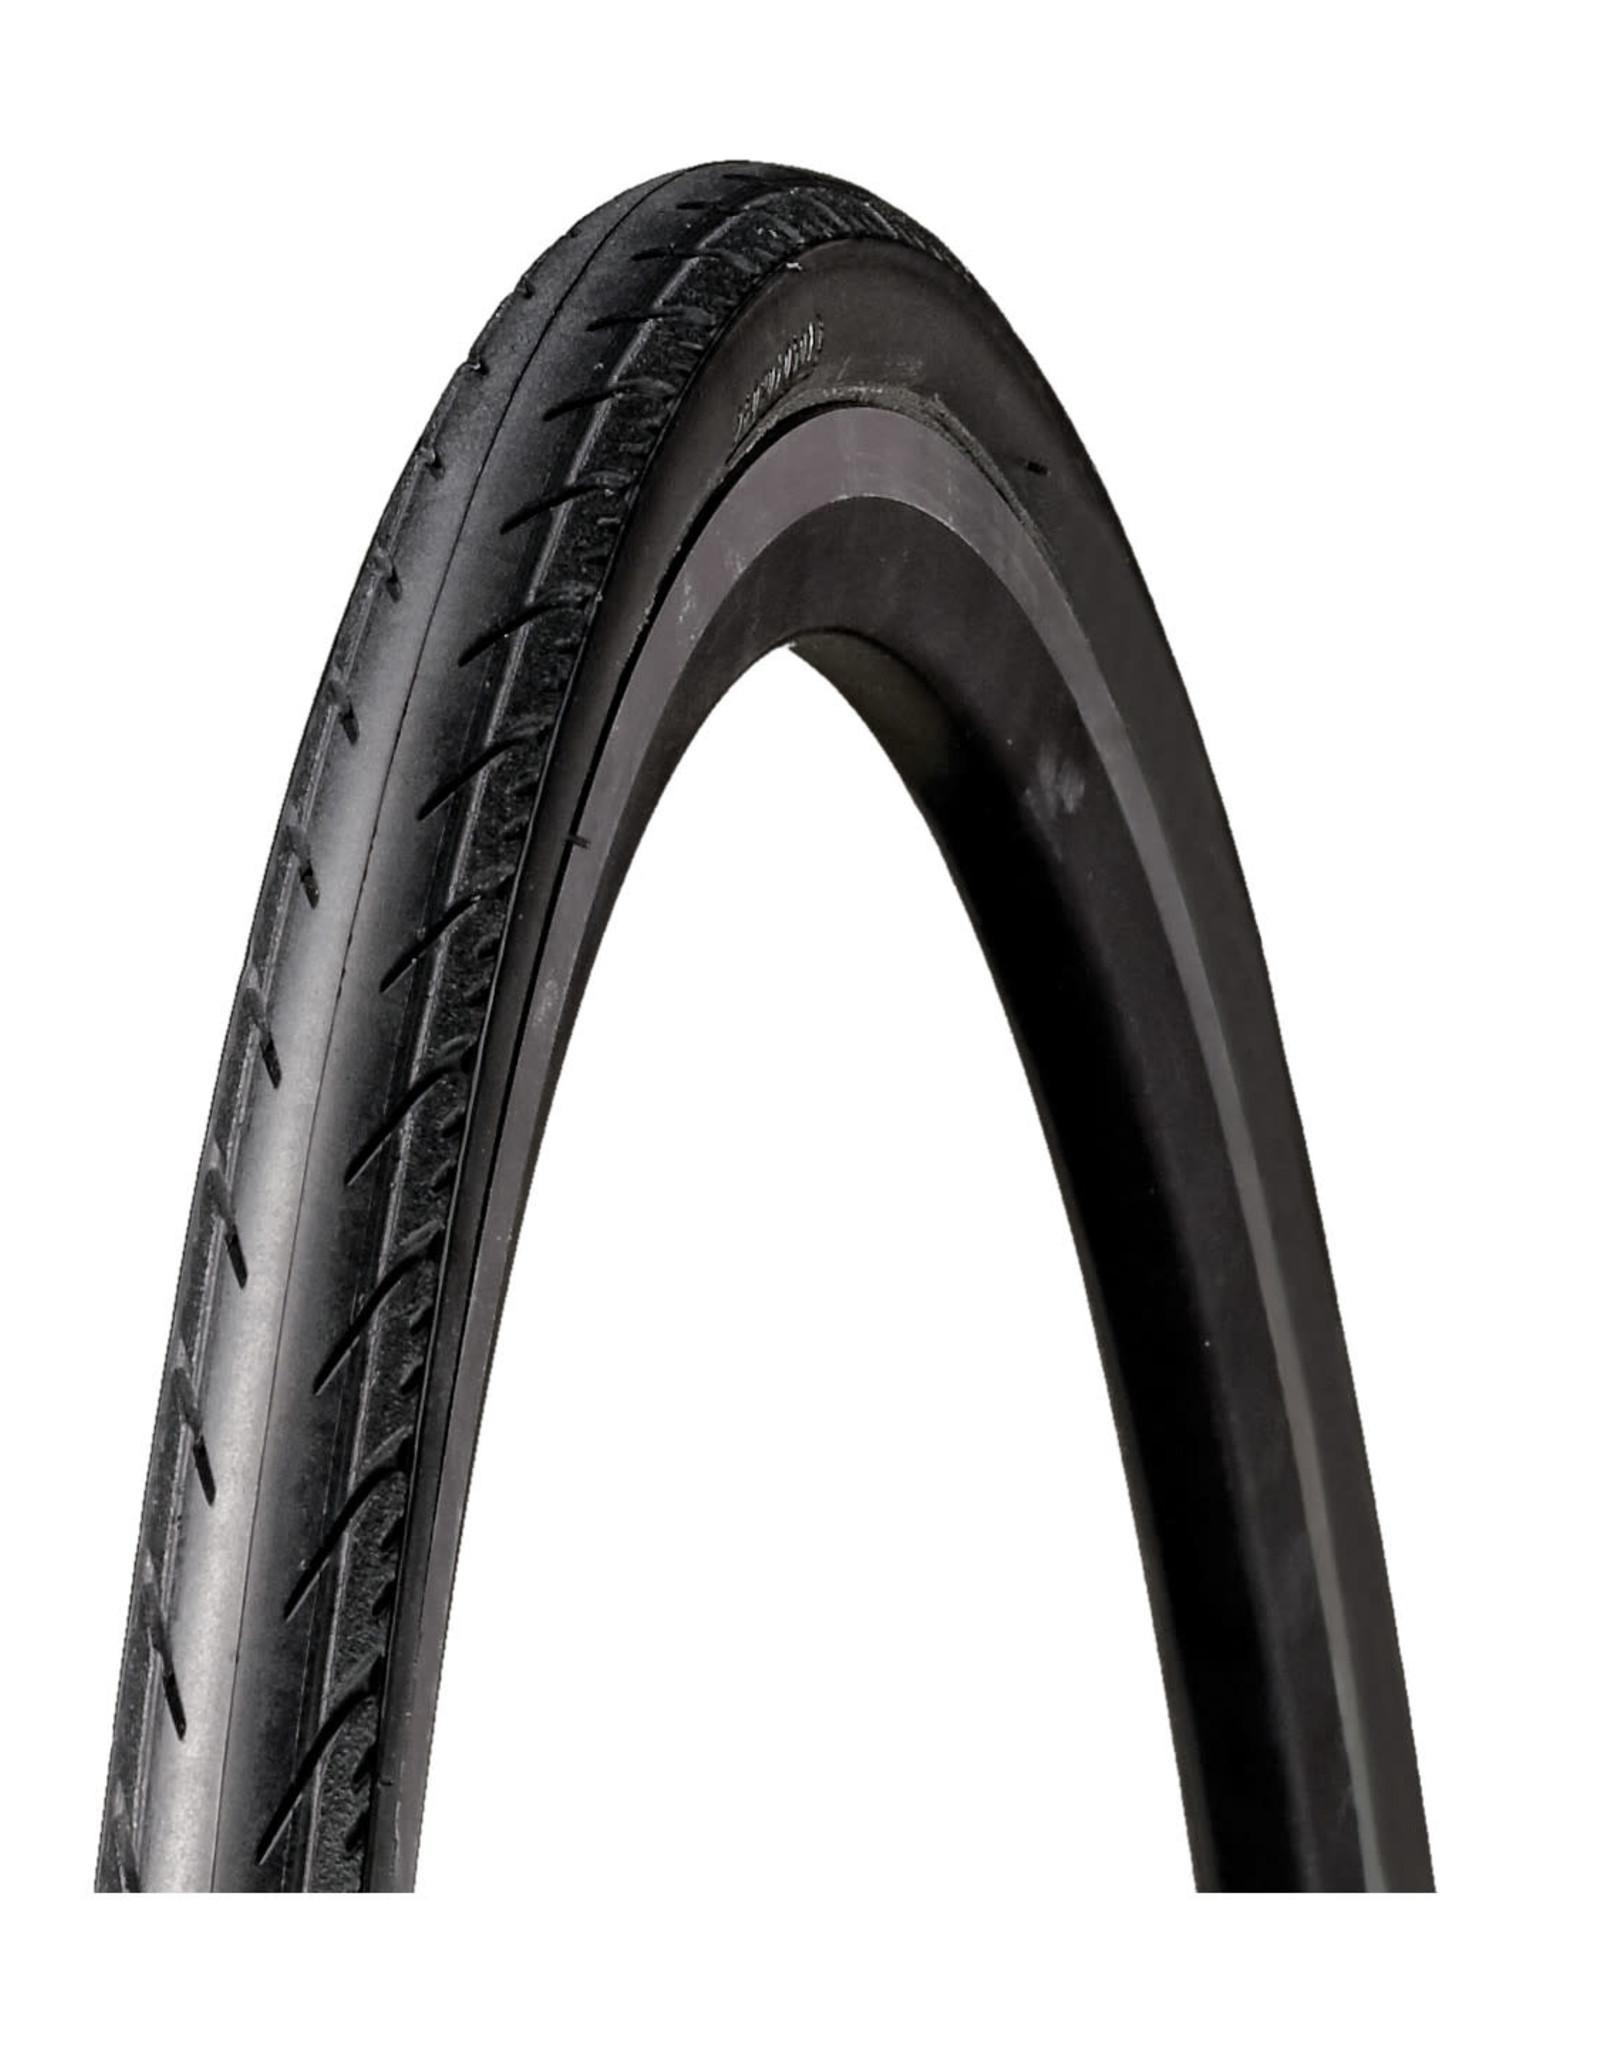 BONTRAGER Bontrager T1 27 x 1-1/8 Blackwall Tire